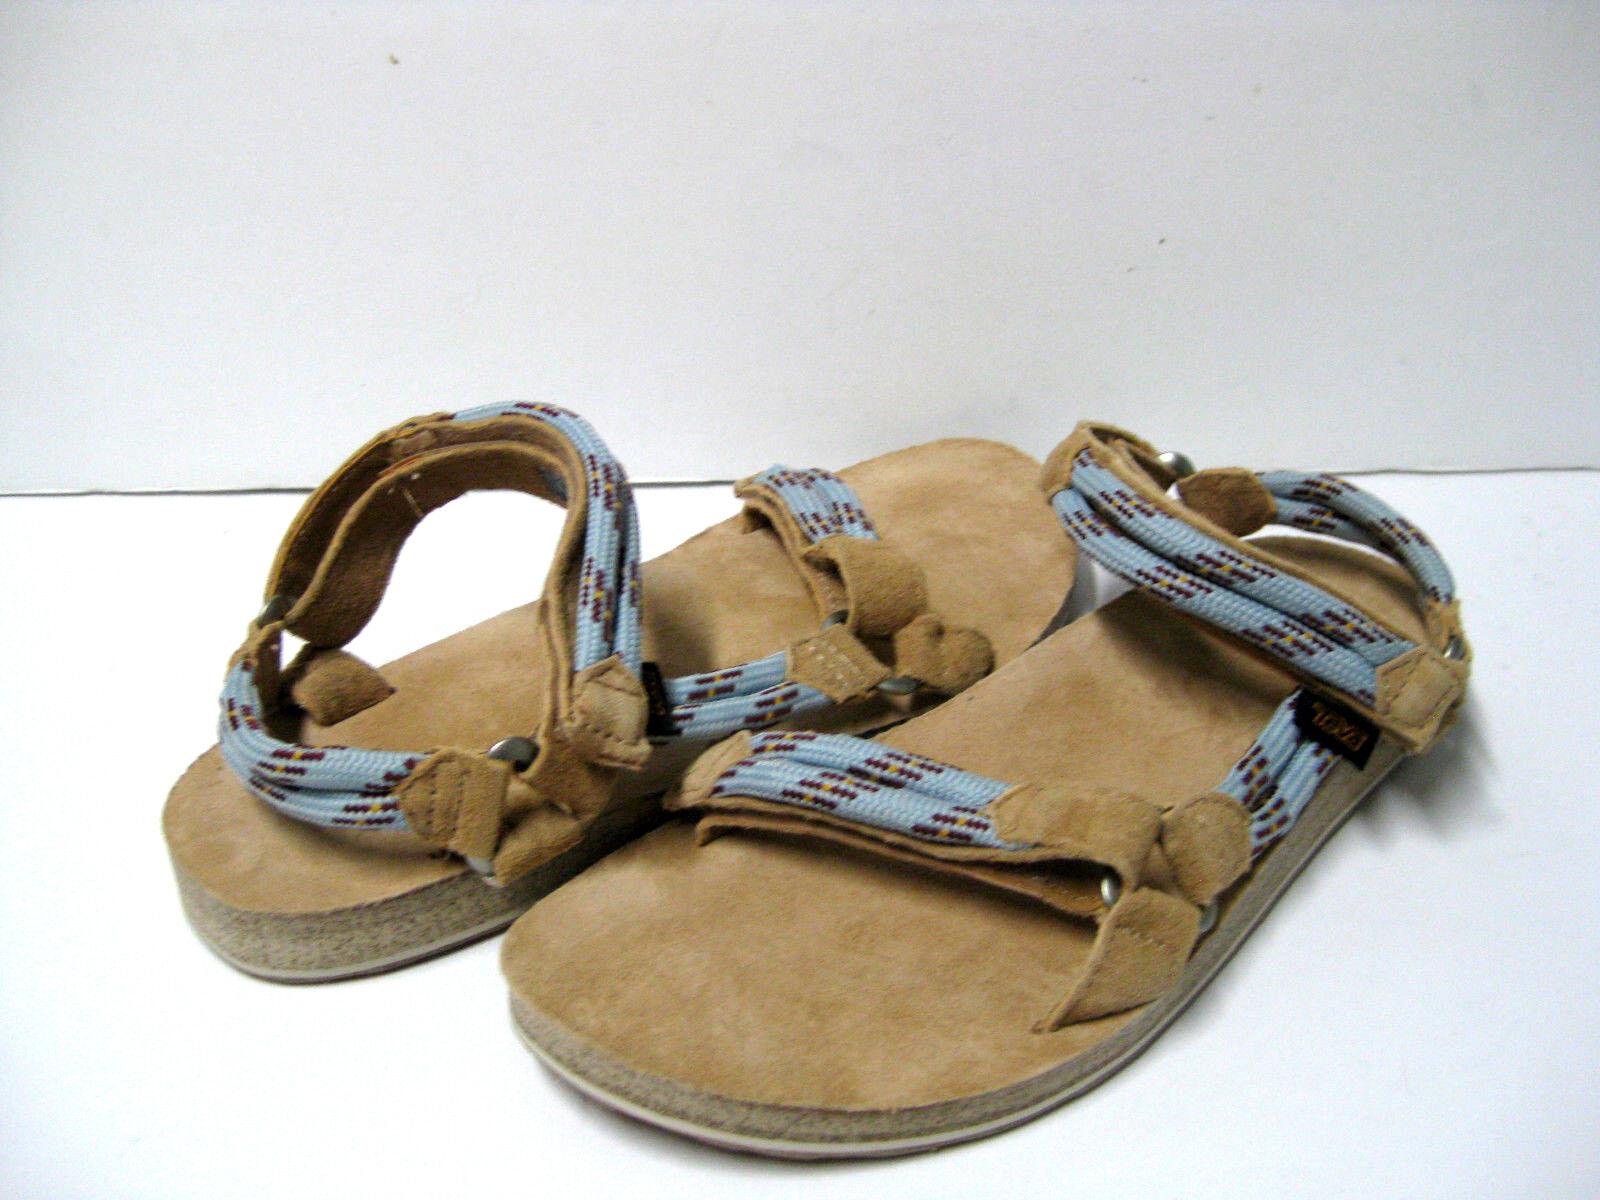 Teva Original Universal Rope Women Sport Sandals Sandals Sandals Canal bluee US 11 UK9 EU42 298b5f